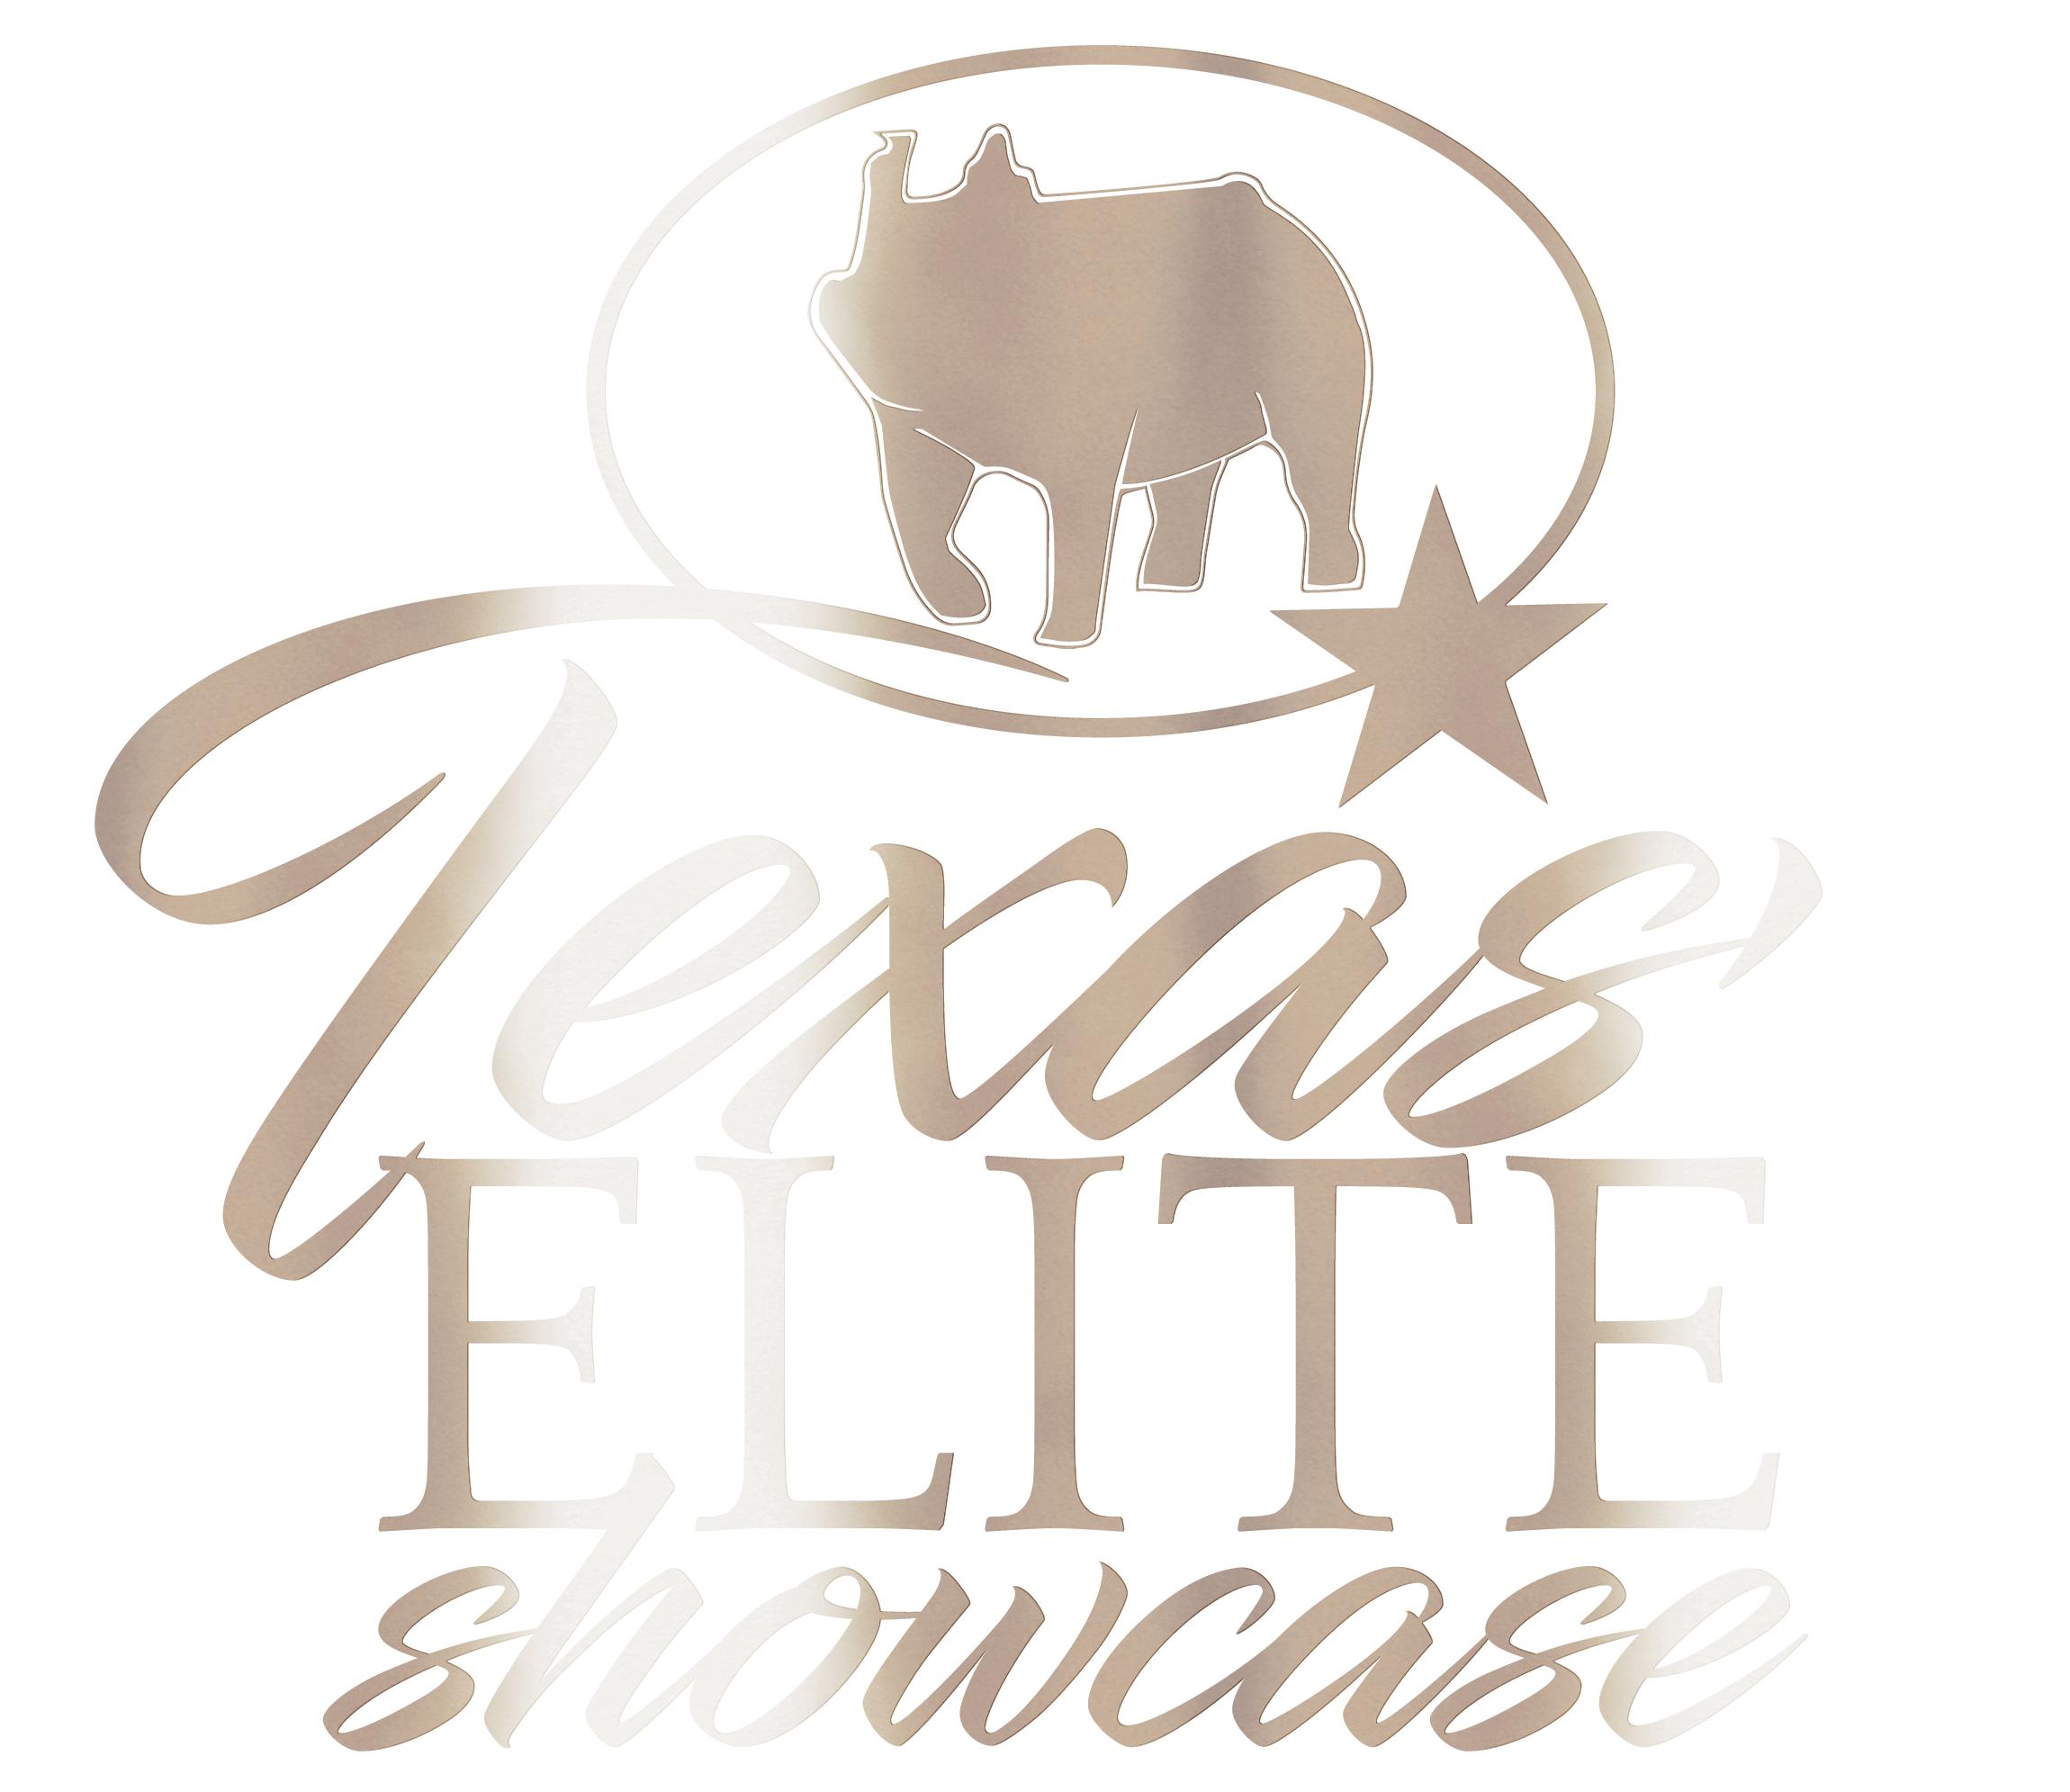 TexasEliteShowcase_logo_silvergold2_noctbr.png